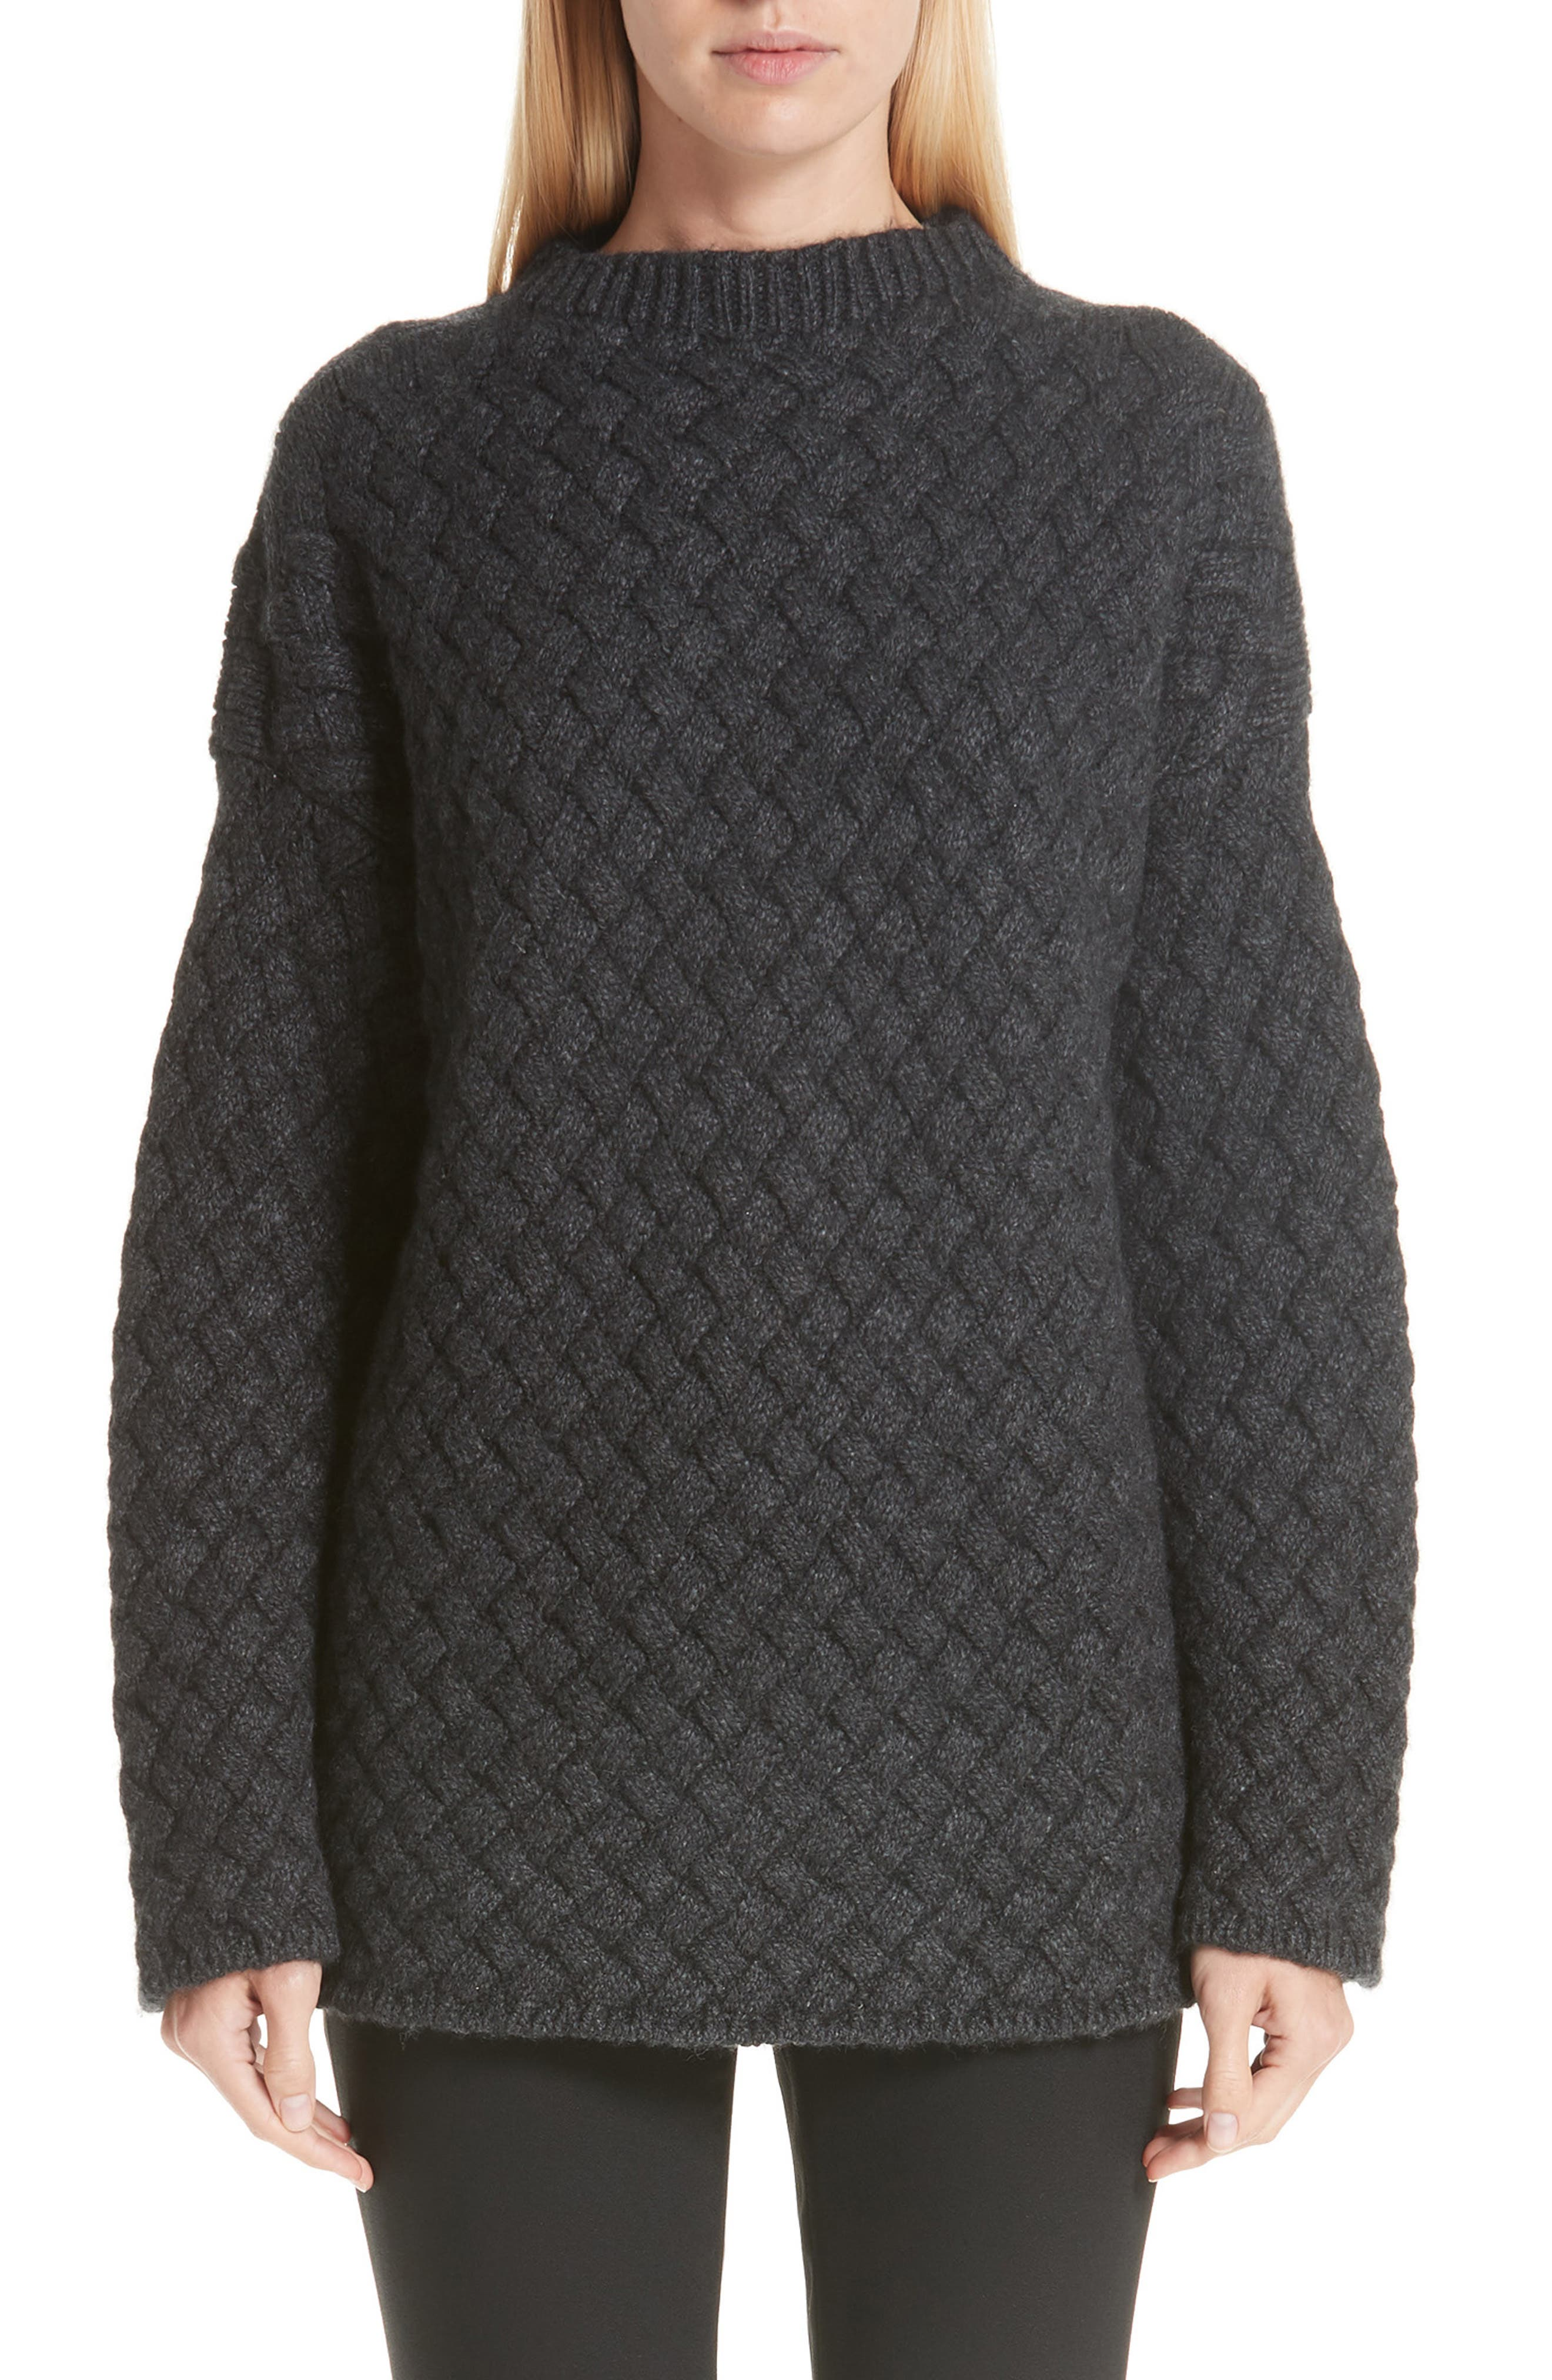 Oversized Braided Cashmere Sweater, Main, color, DARK GREY